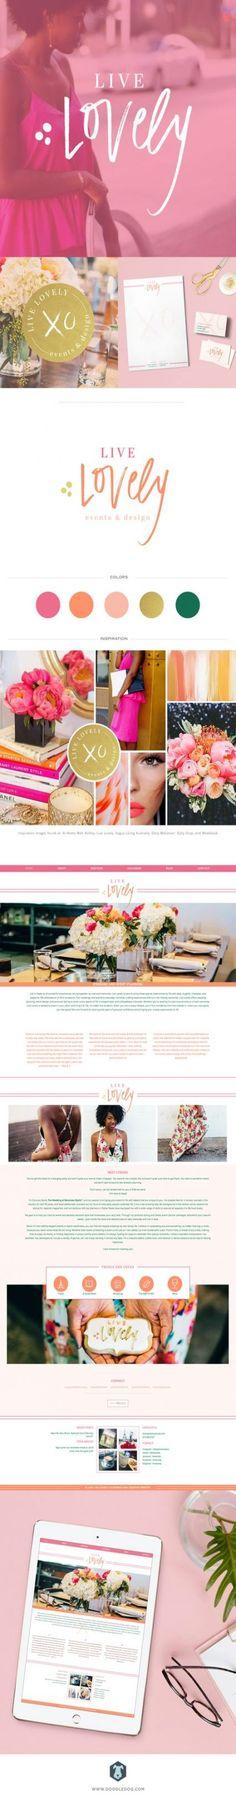 Ideas fashion show logo design Web Design, Fashion Logo Design, Fashion Branding, Logo Inspiration, Website Design Inspiration, Design Ideas, Corporate Design, Logos, Logo Branding